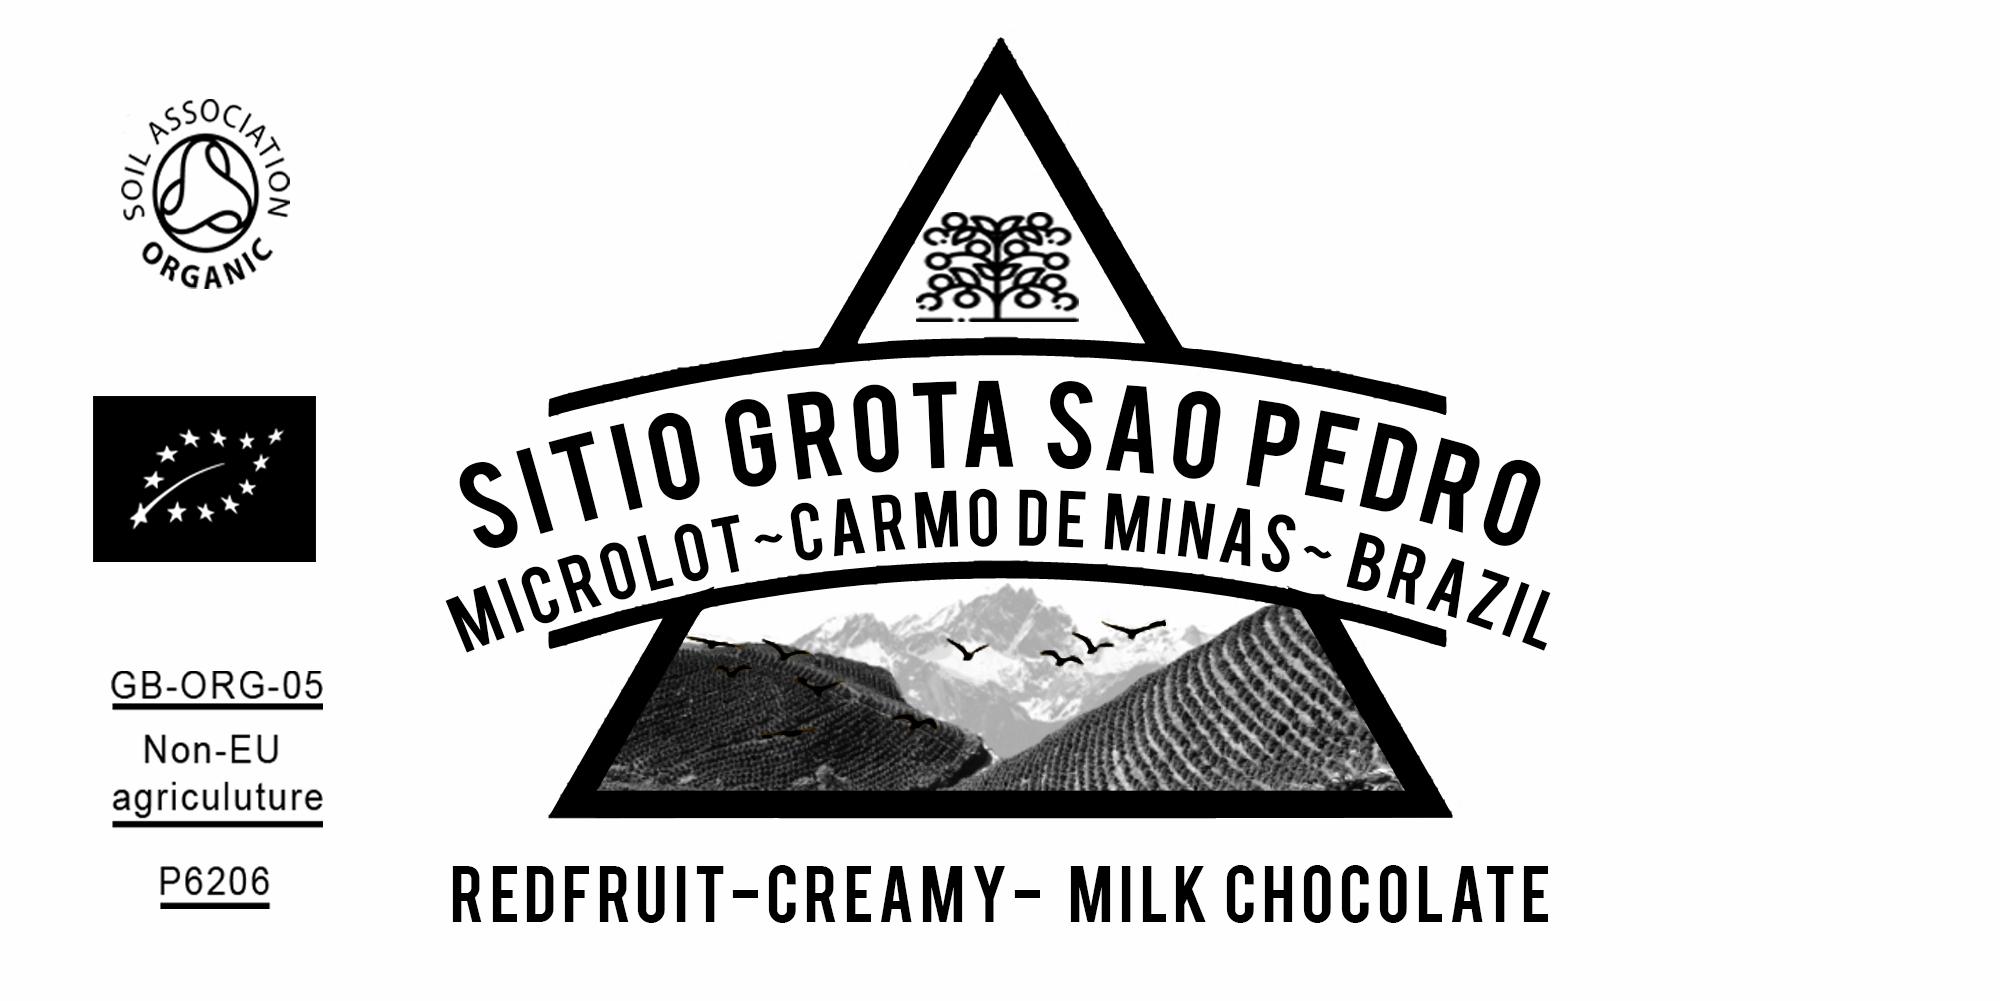 Organic Sitio Grota Sao Pedro Microlot Brazil Coffee